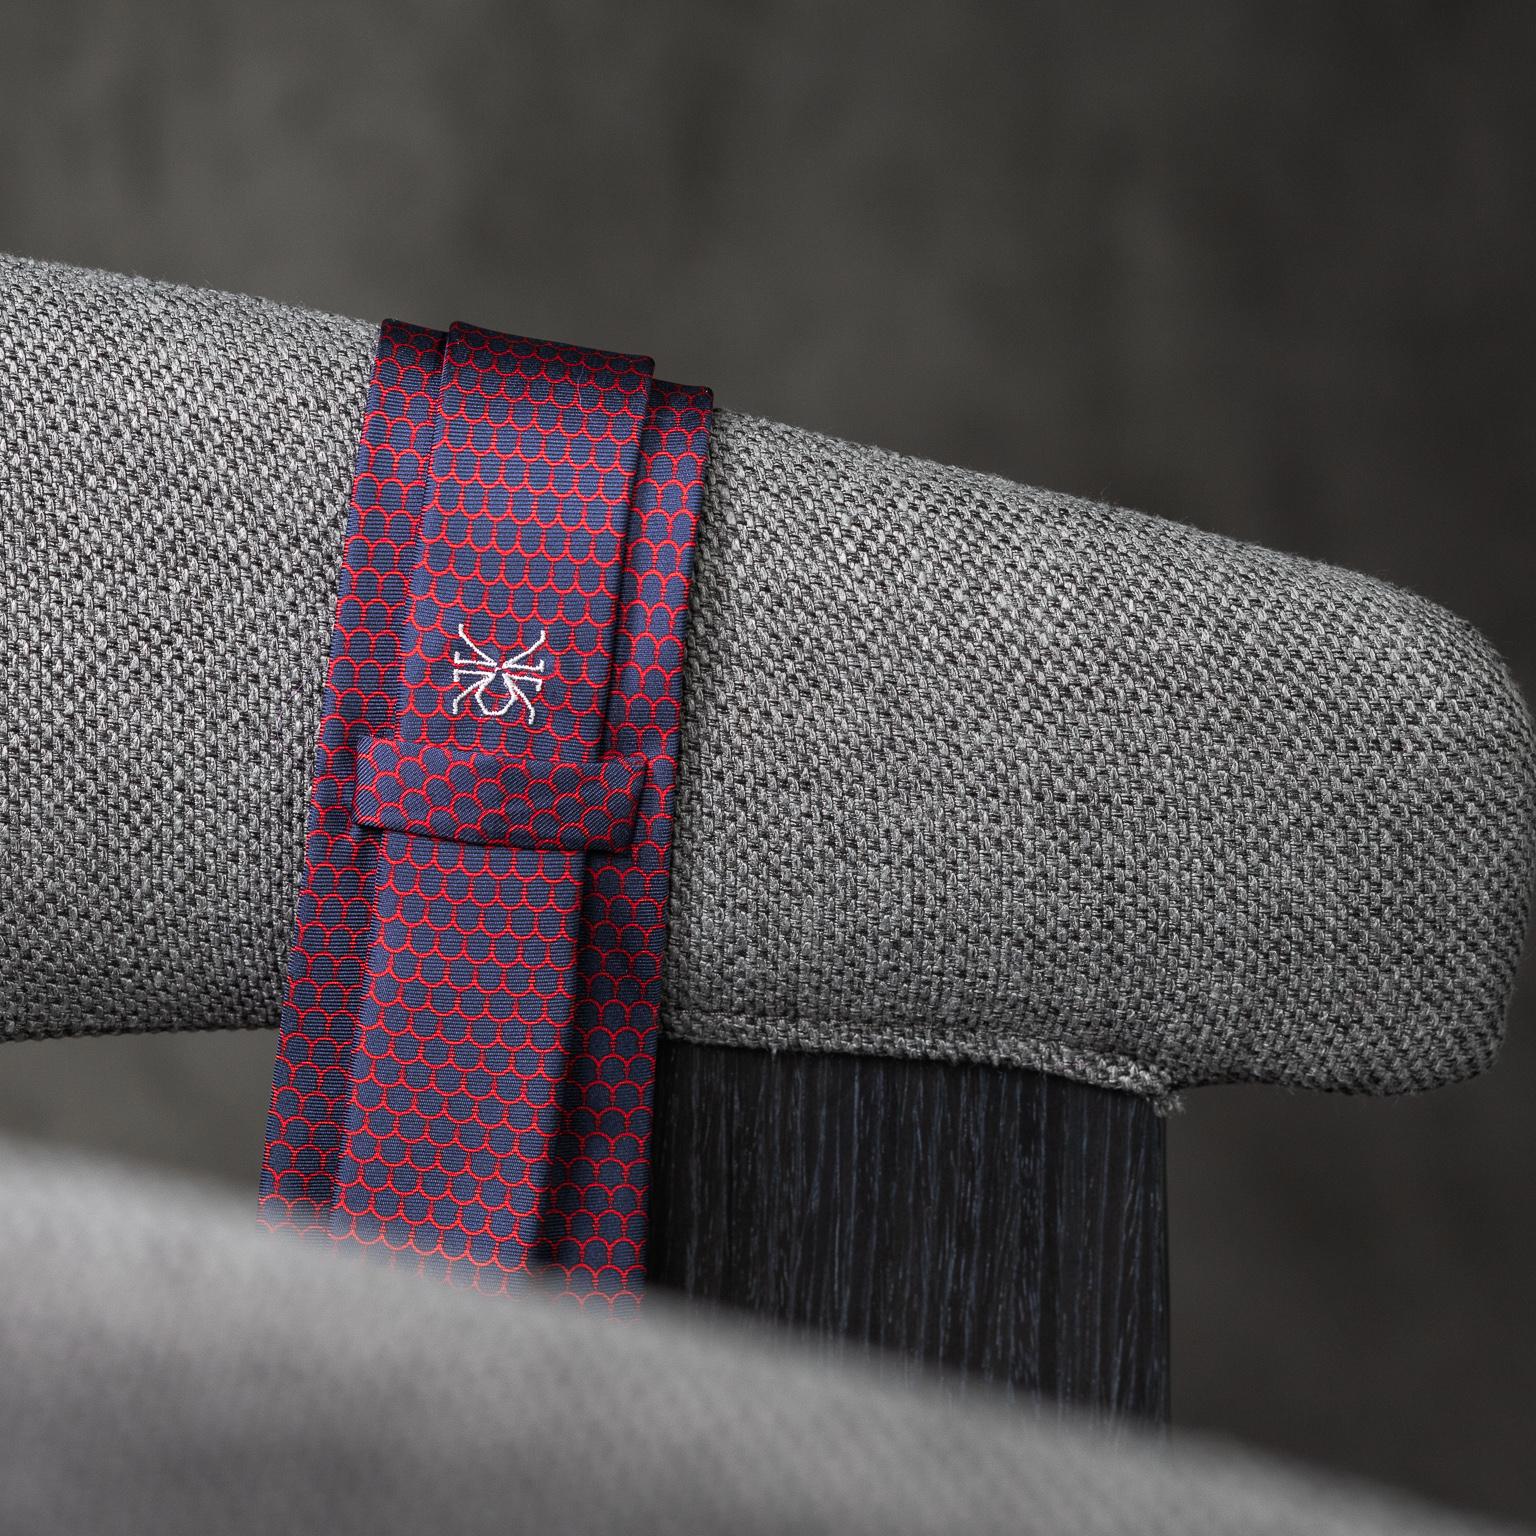 PRINTED-SILK-SEDA-ESTAMPADA-0573-Tie-Initials-Corbata-Iniciales-The-Seëlk-4